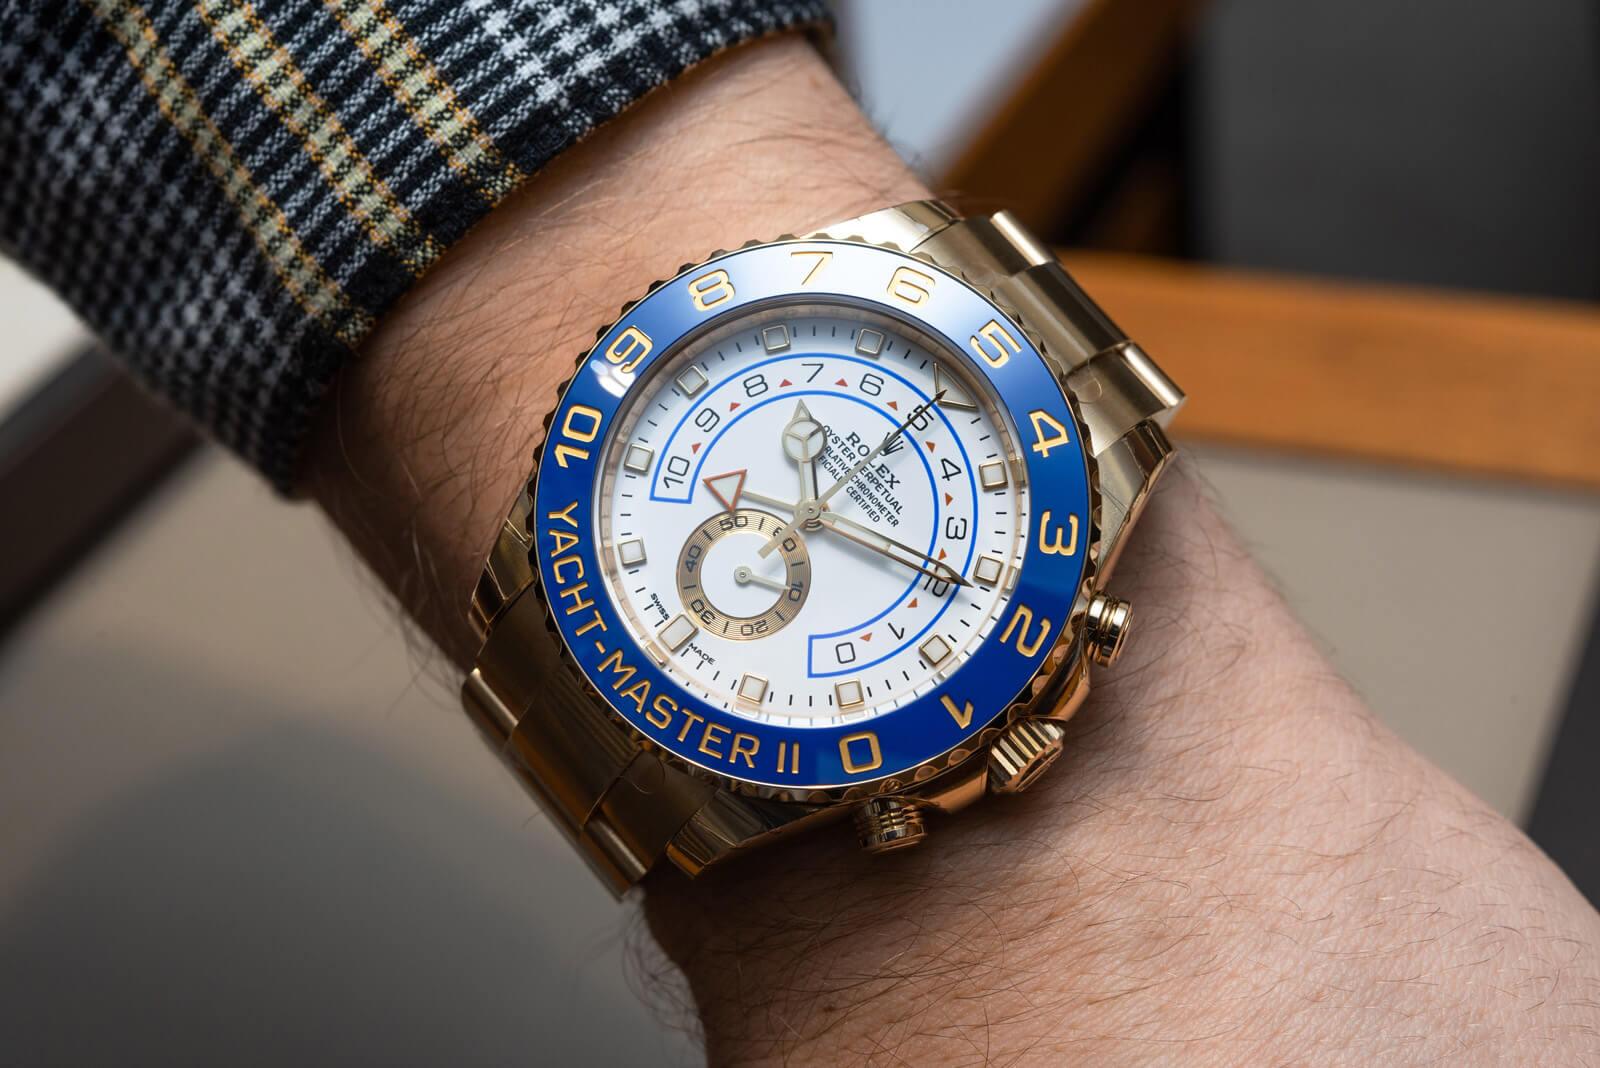 Rolex Yacht-Master II <br> Referenca 116688